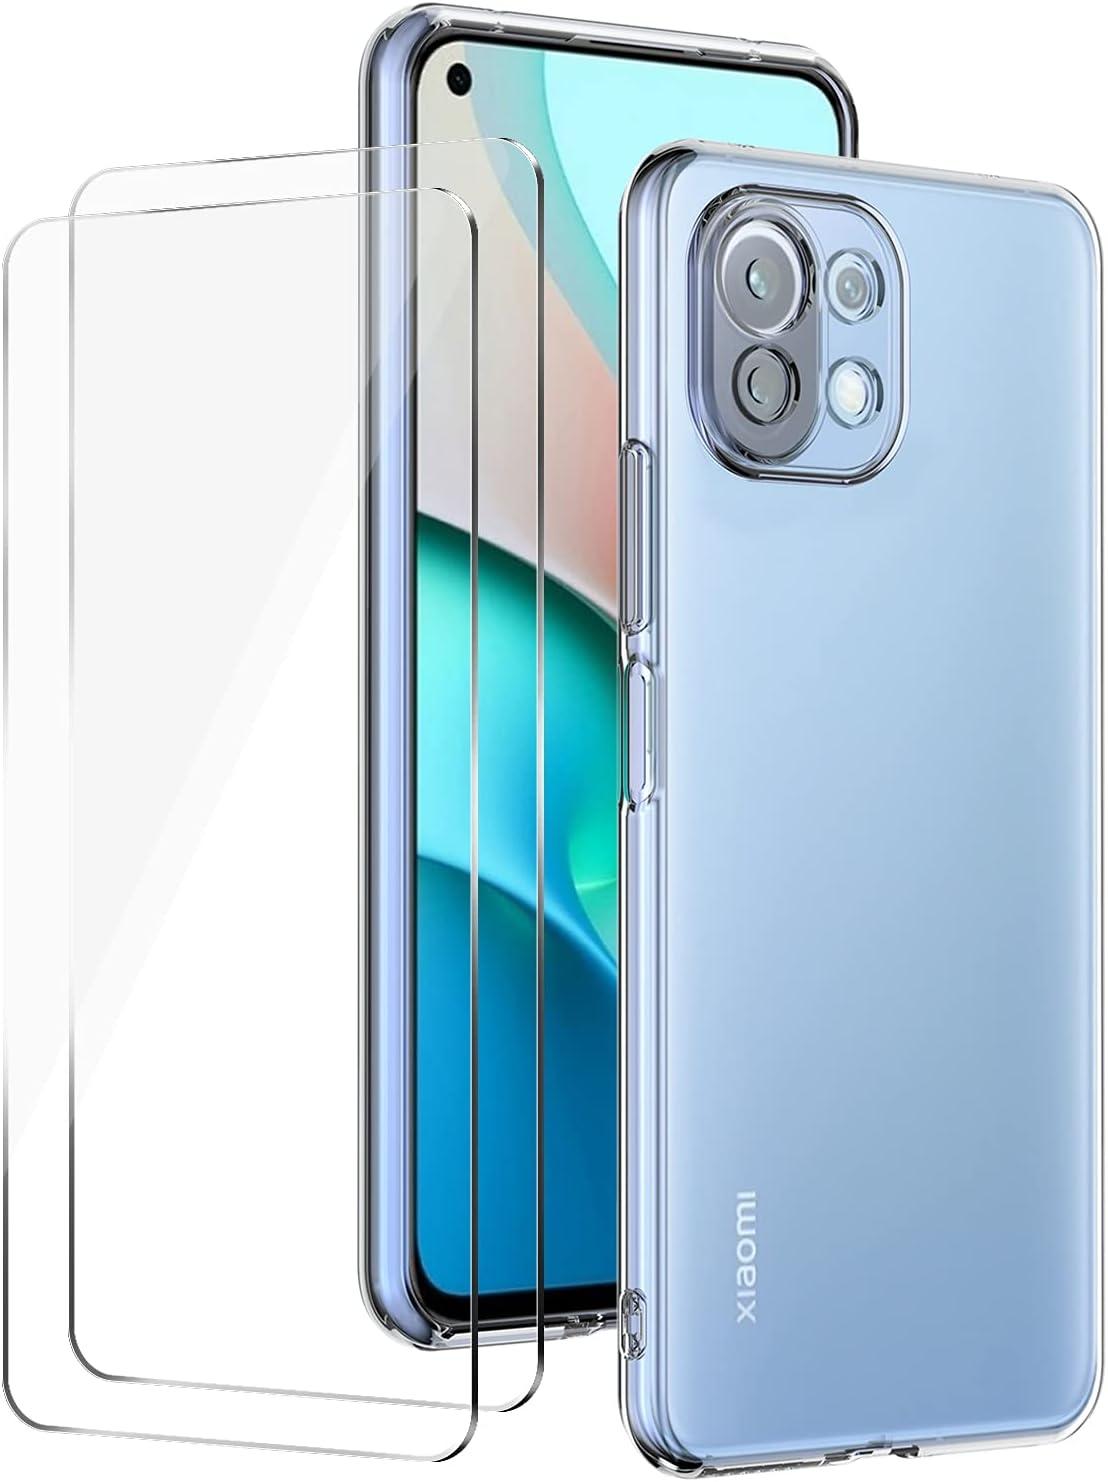 Funda para Xiaomi Mi 11 Lite 5G/4G + 2 Piezas Cristal Templado Protector de Pantalla, Carcasa TPU Silicona Anti-Choques y Anti- Arañazos - Transparente